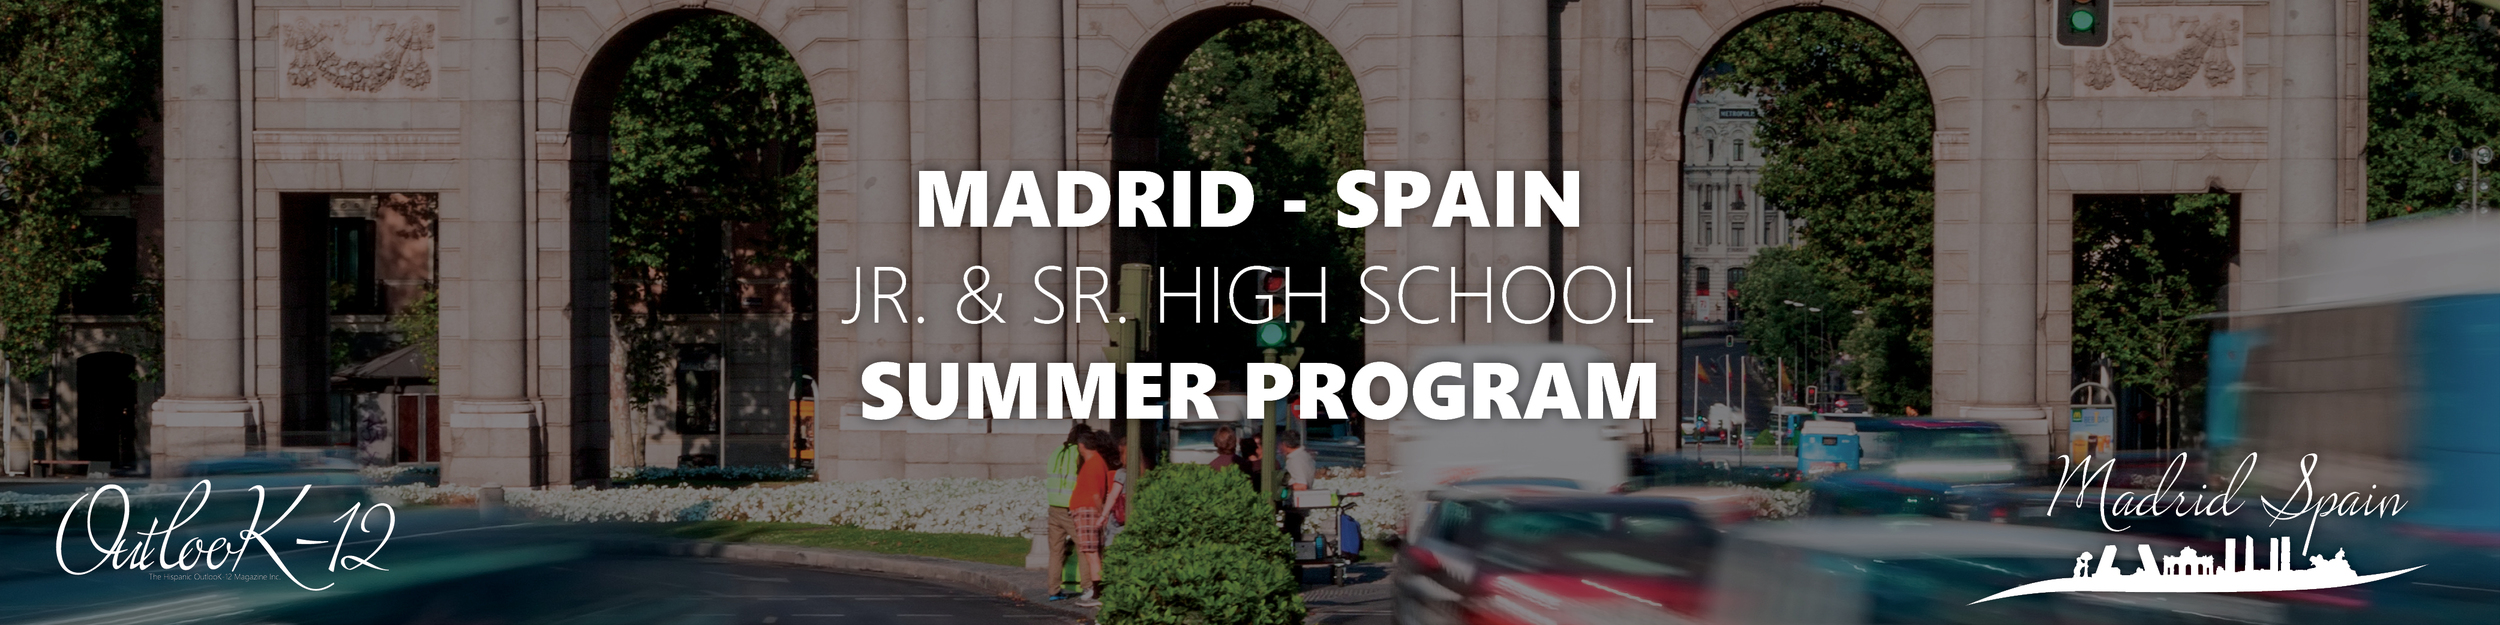 Spain Summer Program